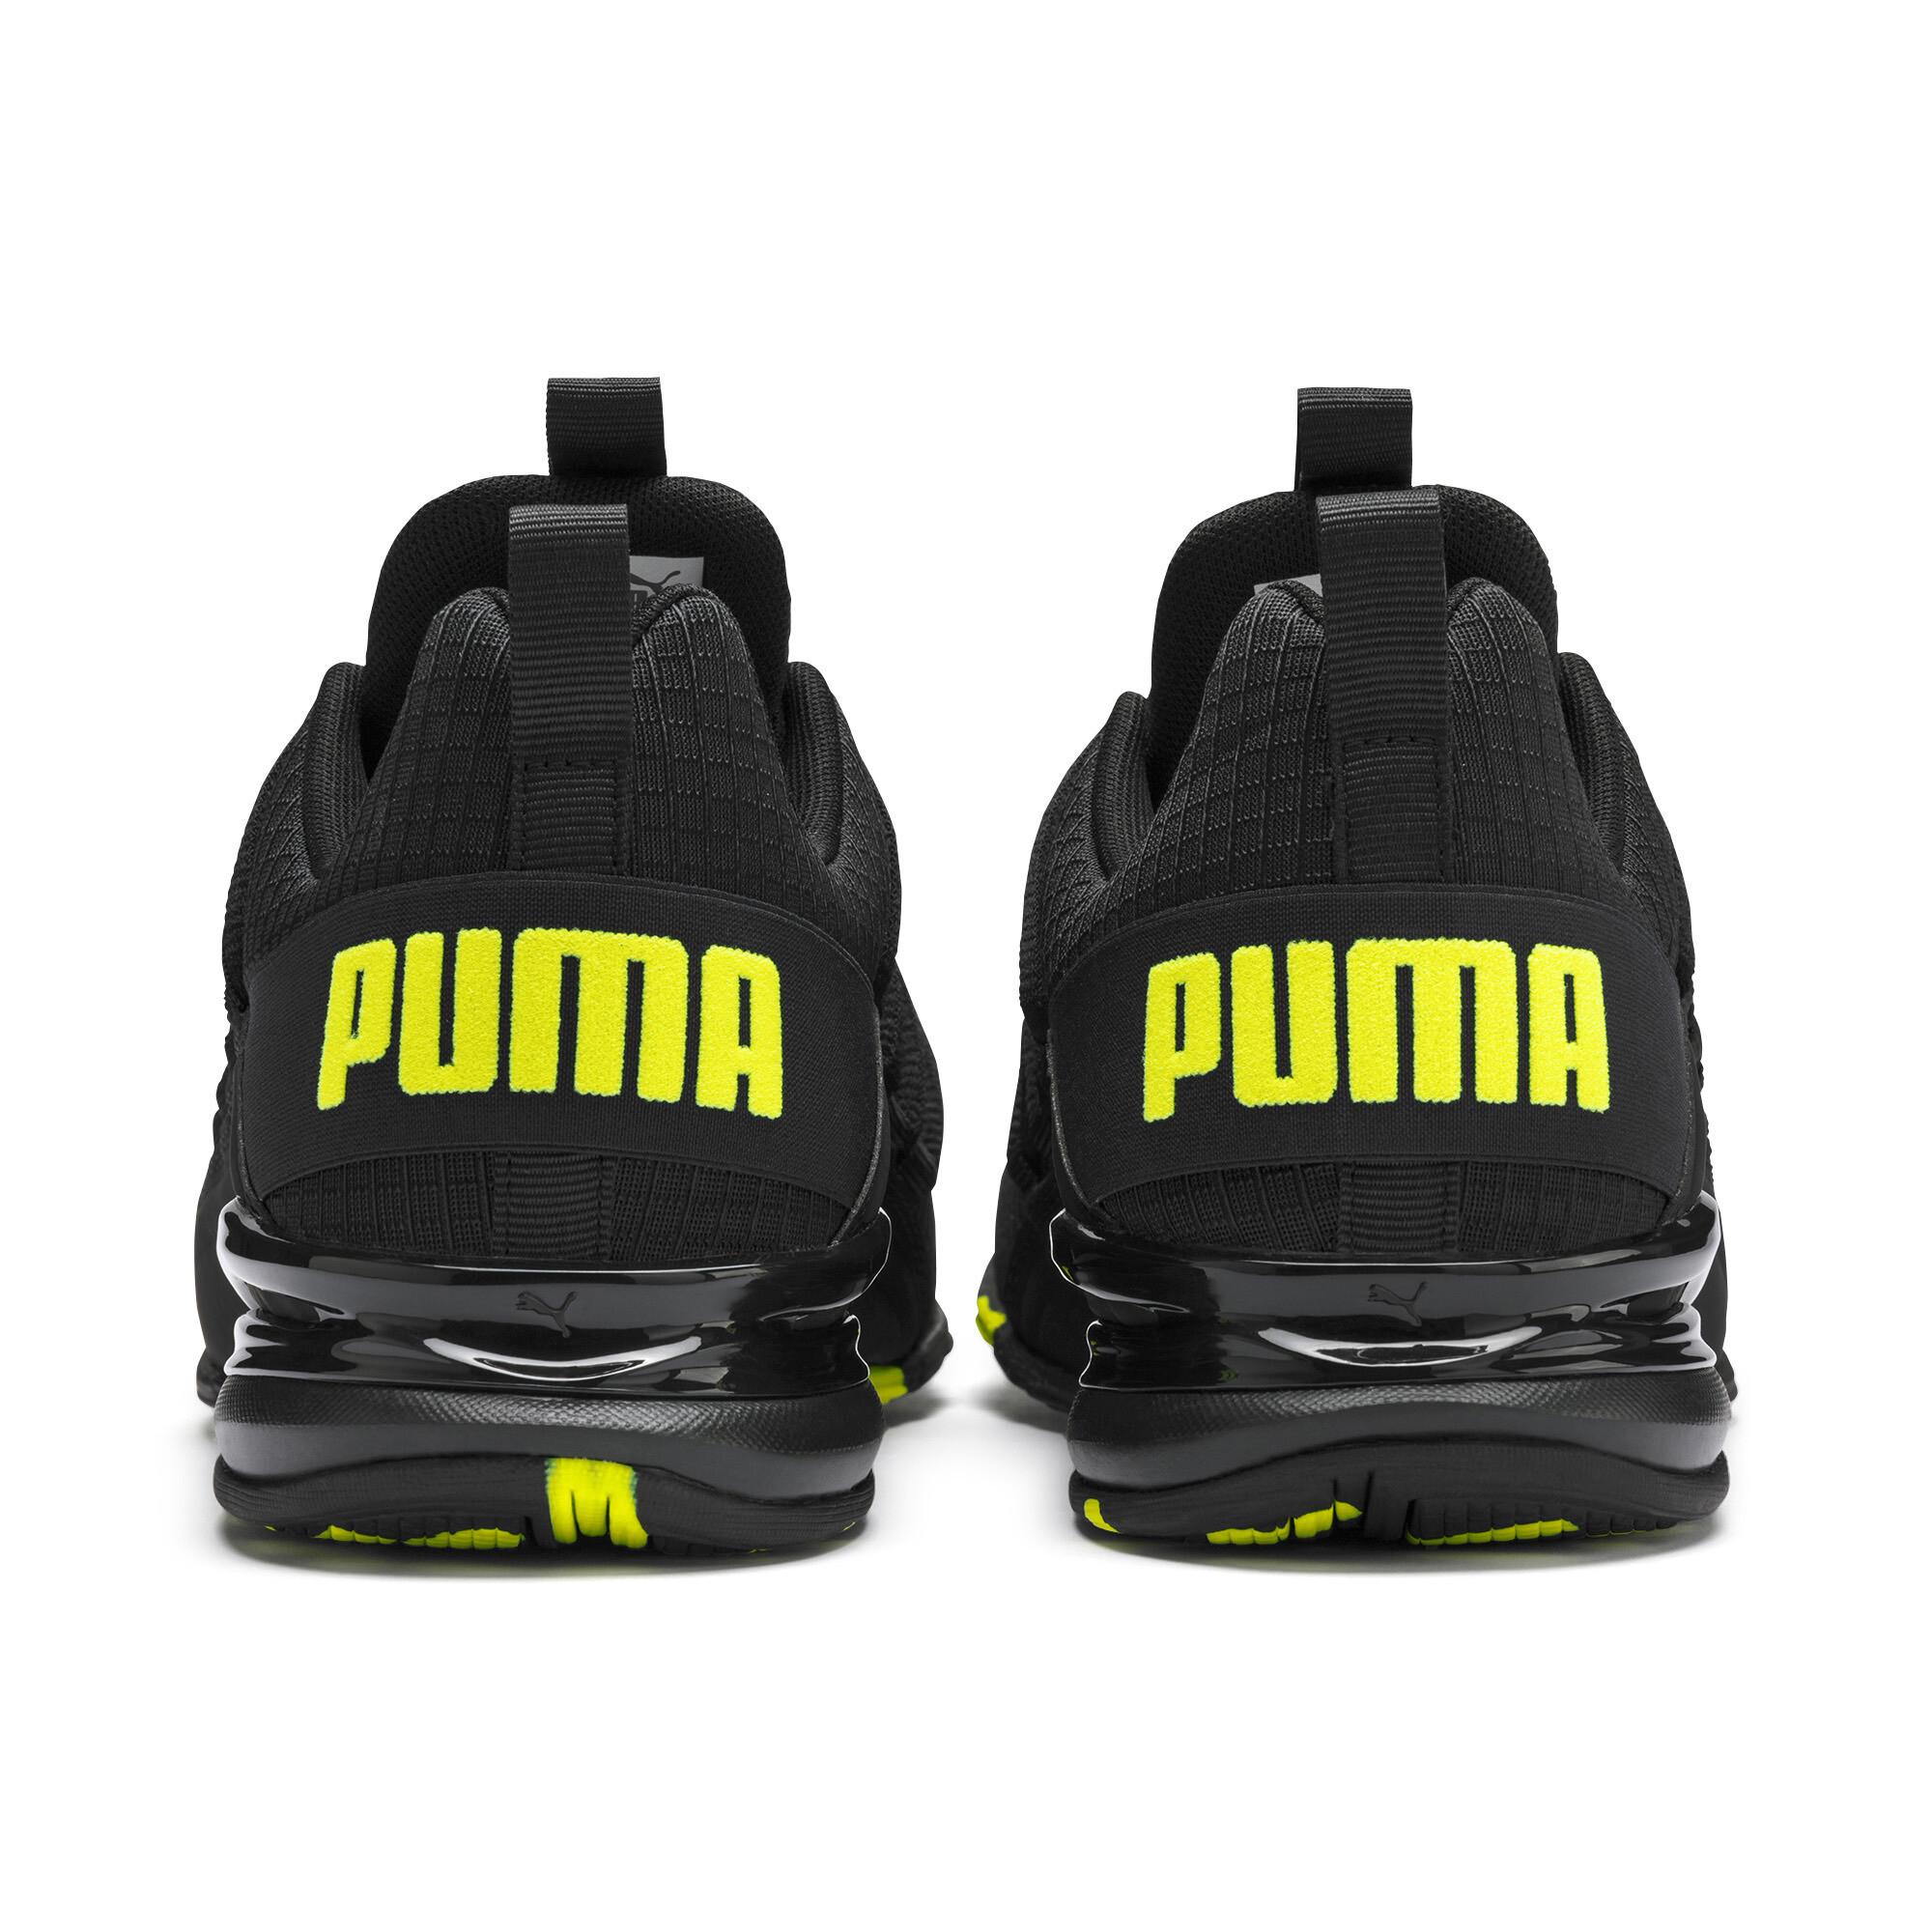 PUMA-Men-039-s-Axelion-Rip-Training-Shoes thumbnail 10